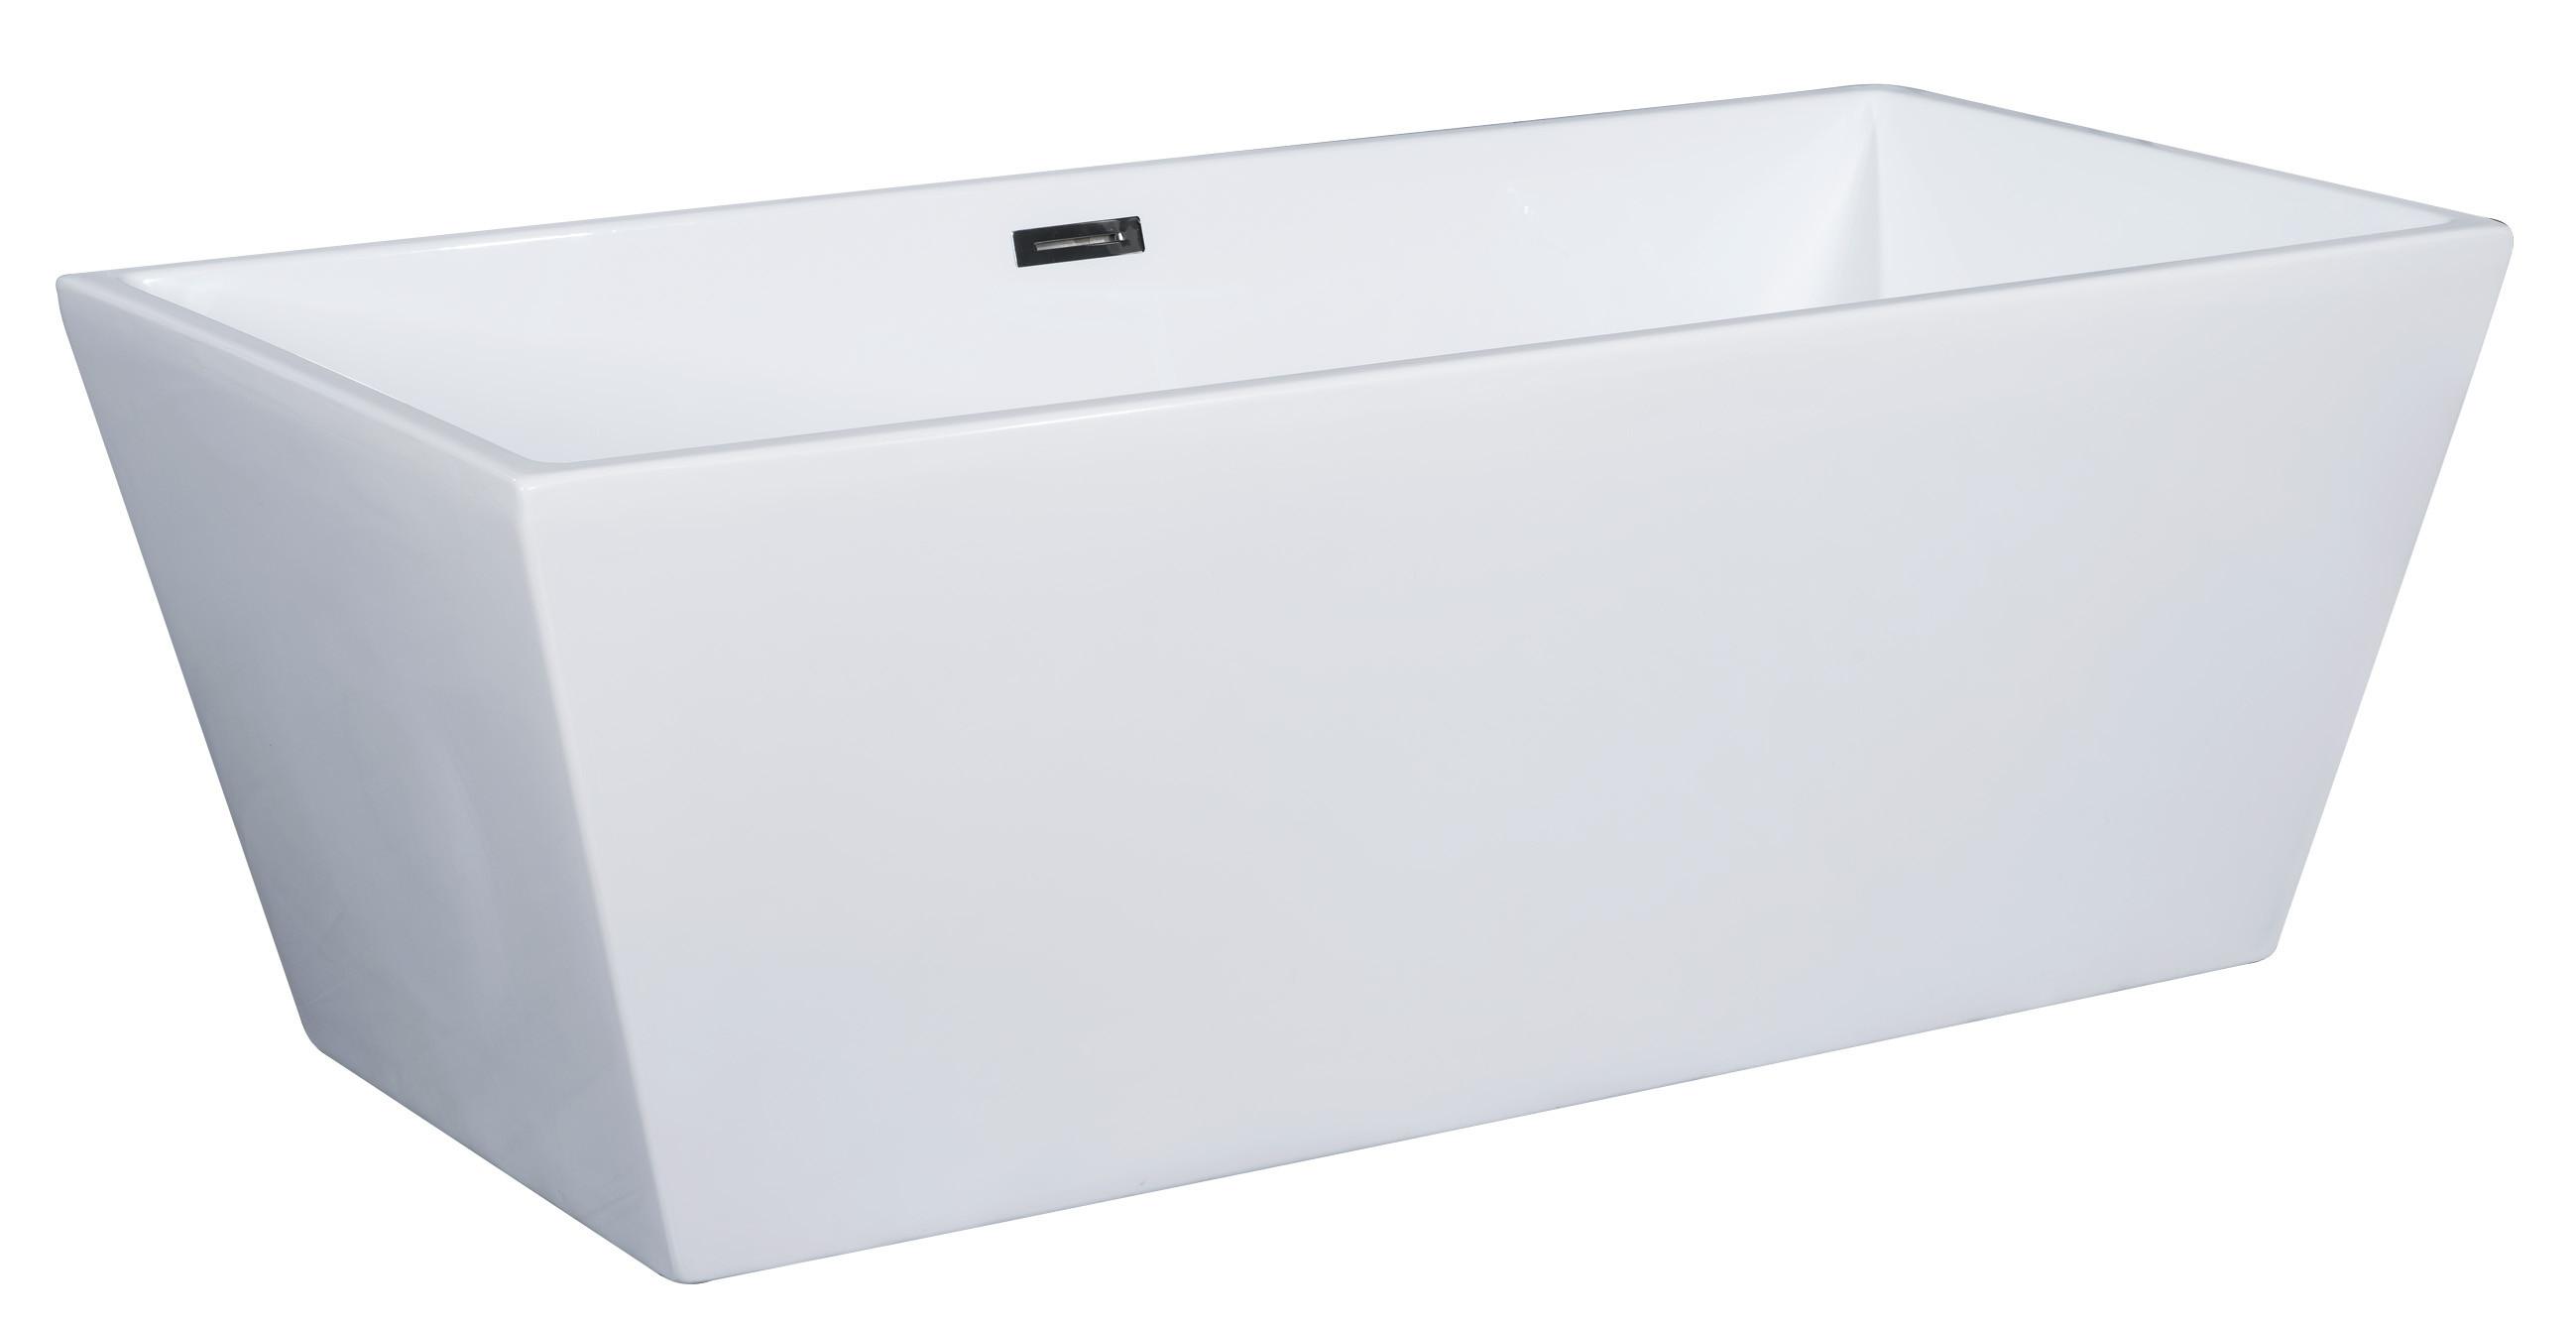 ALFI brand AB8832 67 Inch White Rectangular Acrylic Free Standing Soaking Bathtub